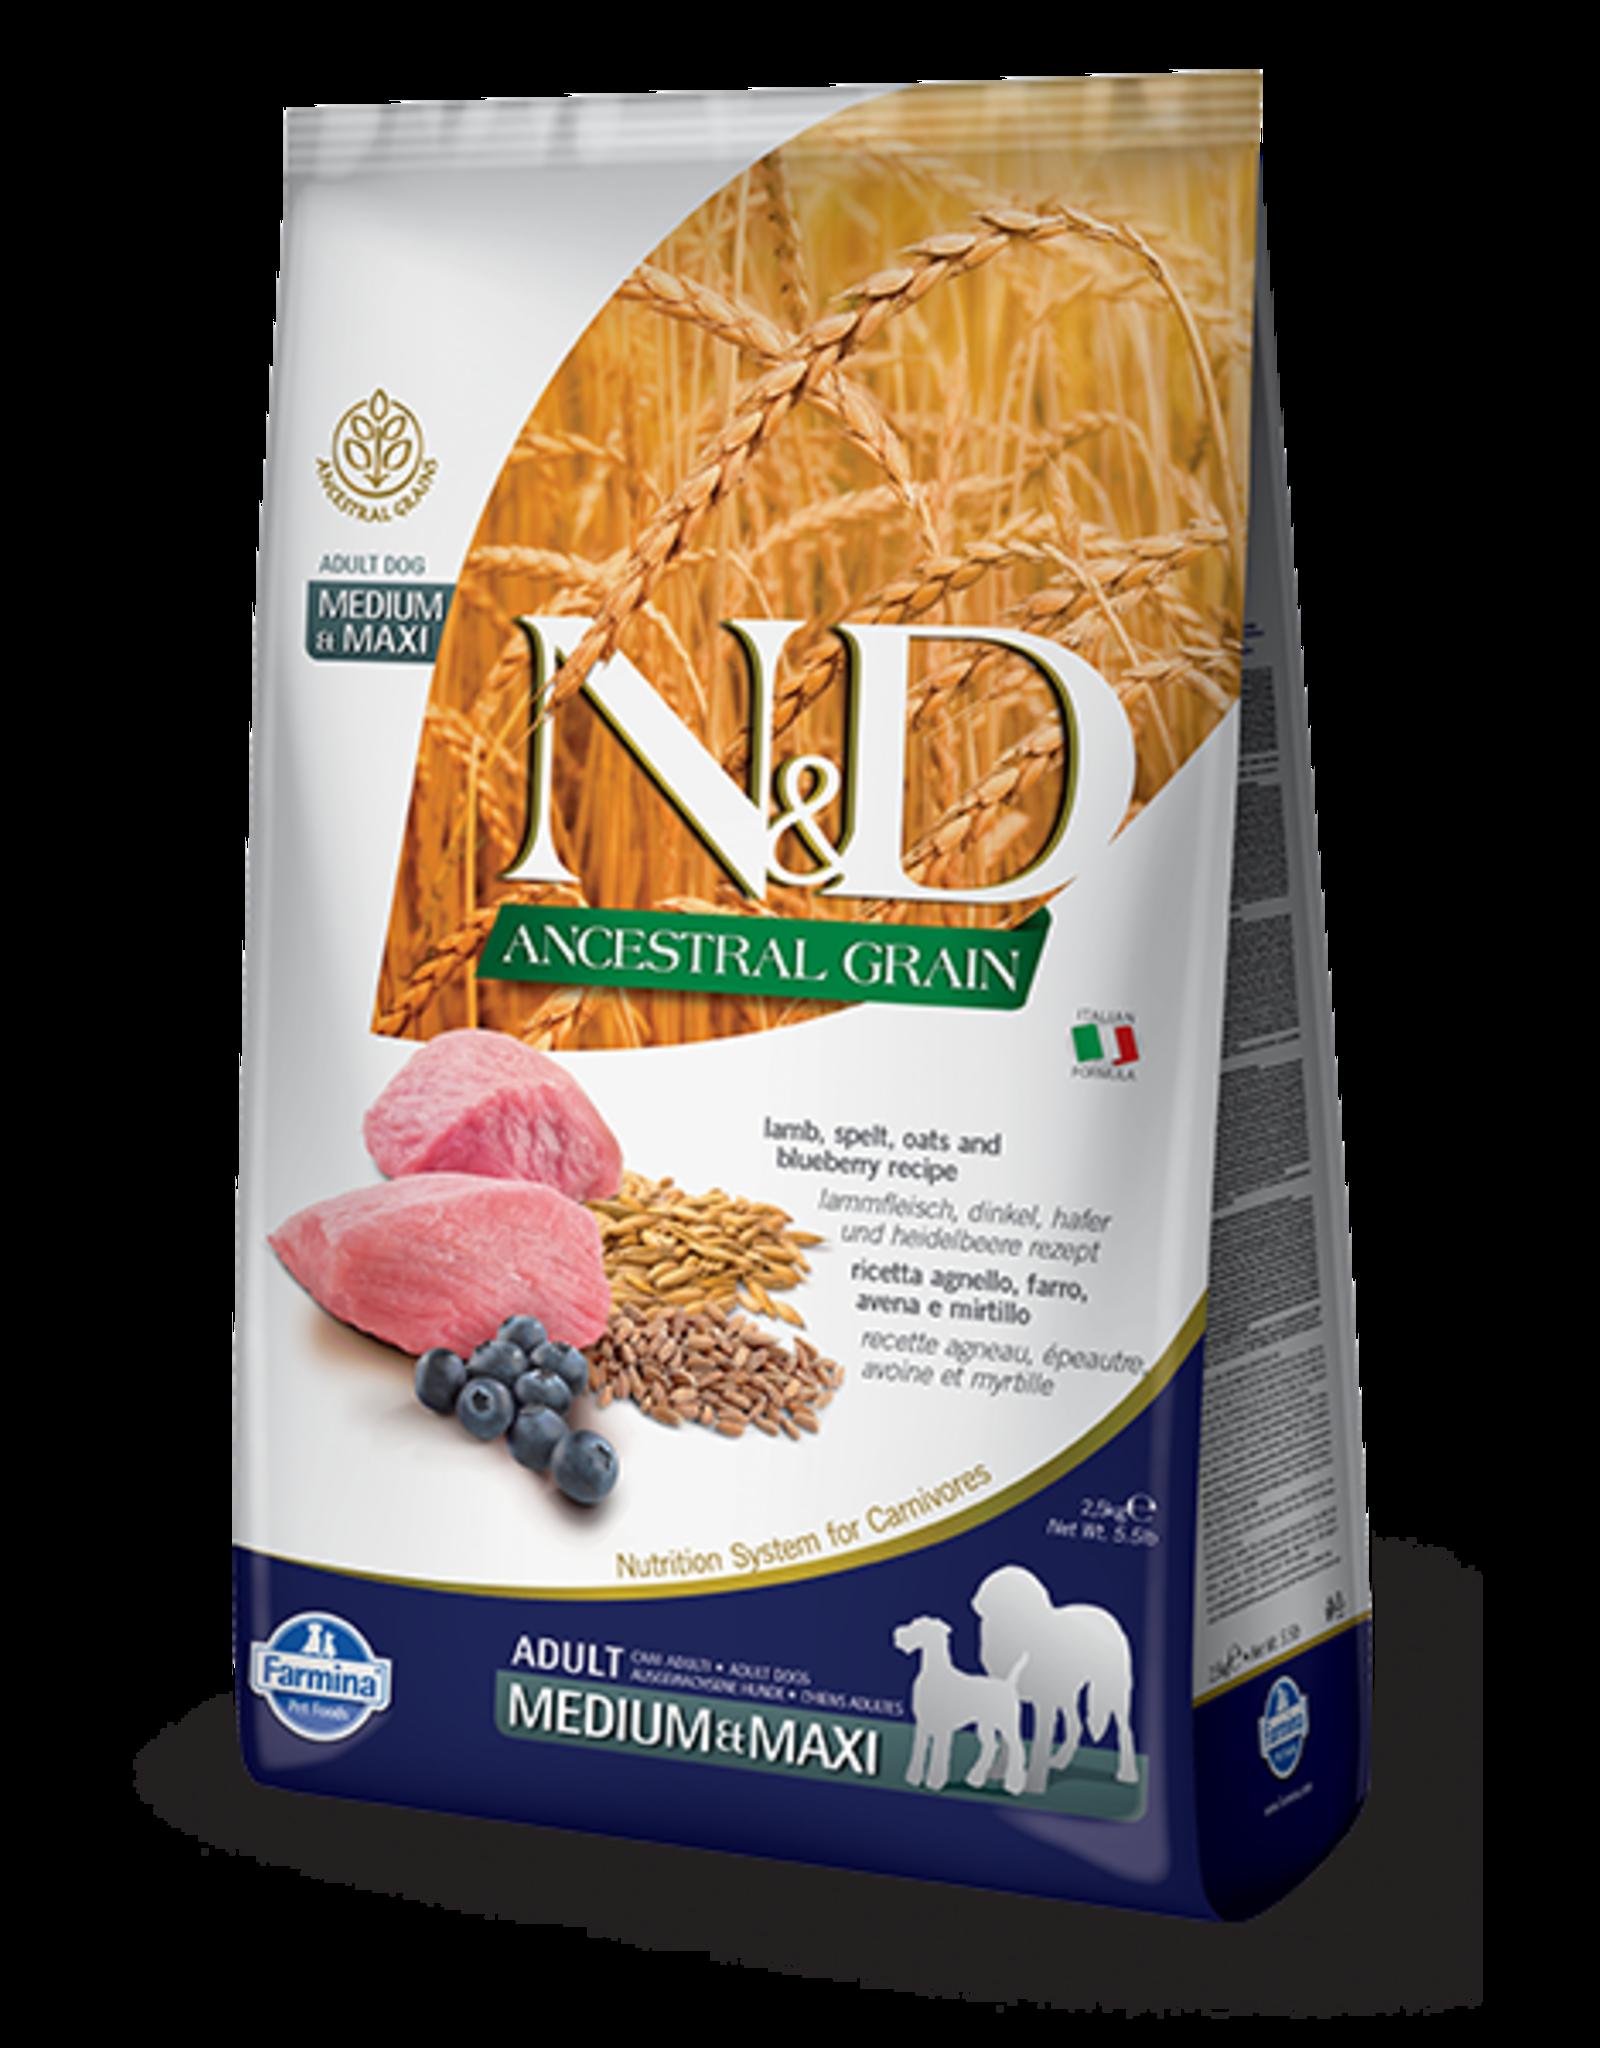 Farmina N&D Farmina N&D Ancestral Grain Lamb & Blueberry Adult Med/Max Dog Food